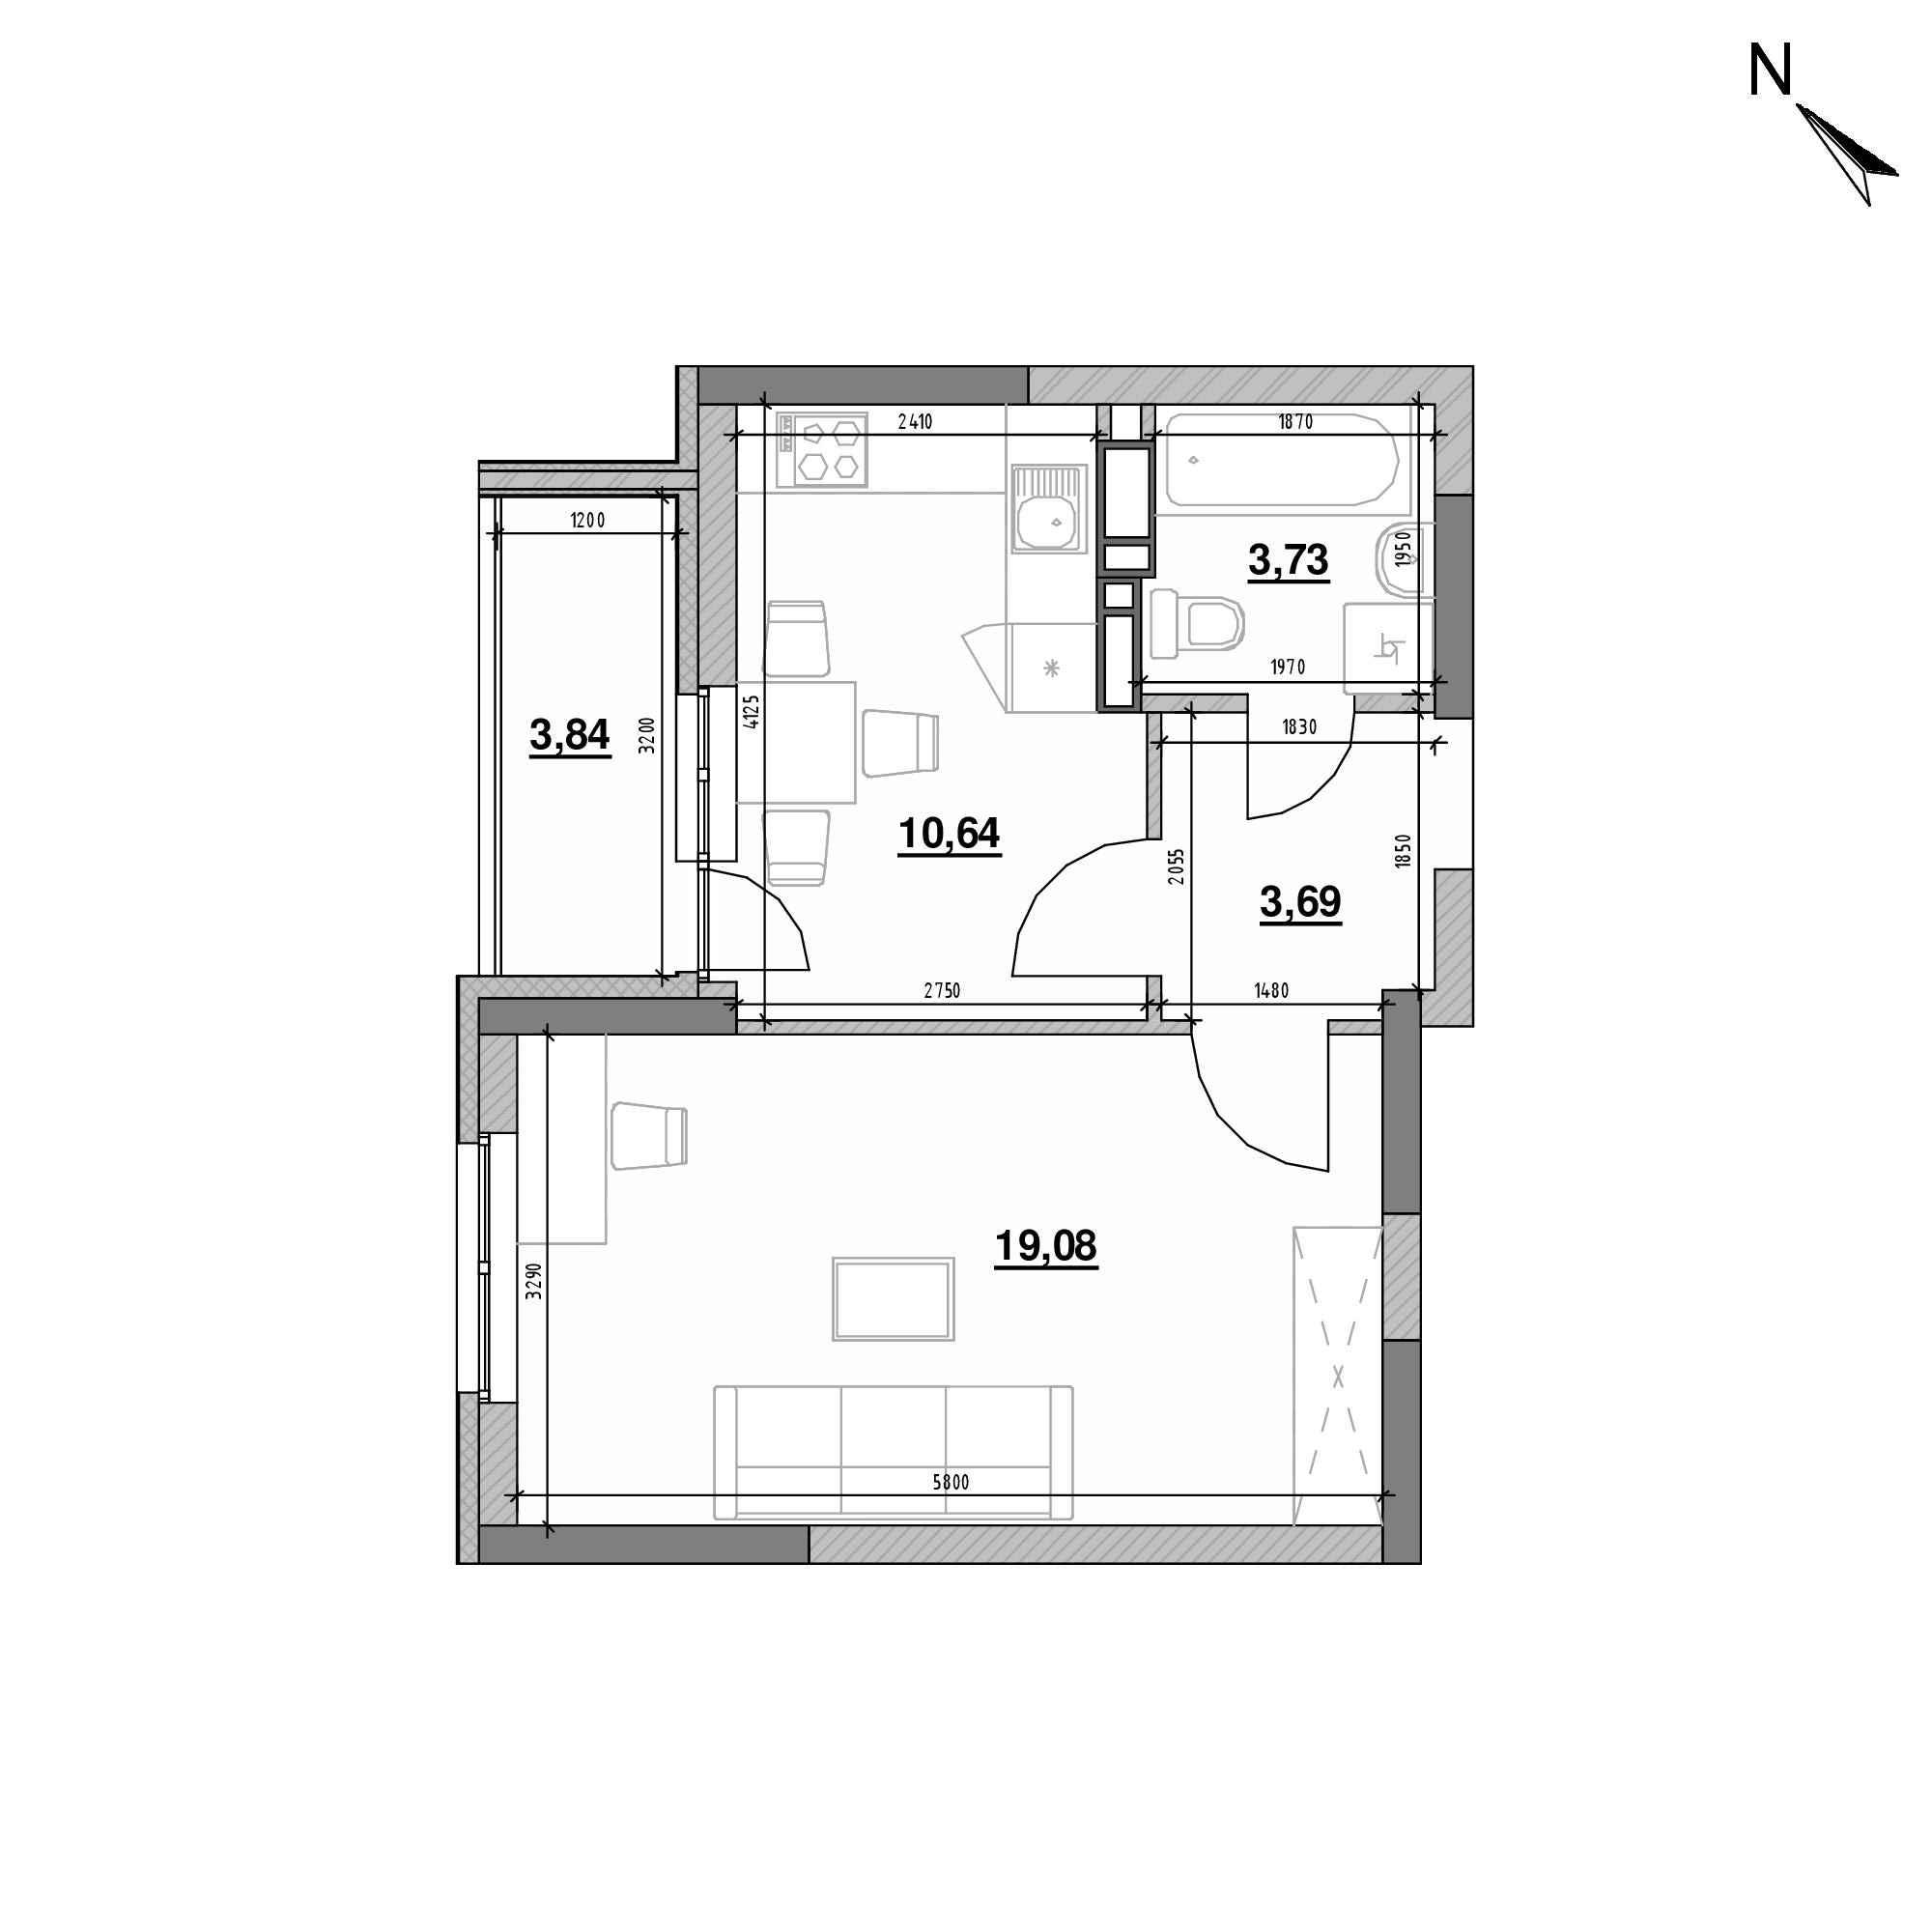 ЖК Оk'Land: планування 1-кімнатної квартири, №241, 40.98 м<sup>2</sup>